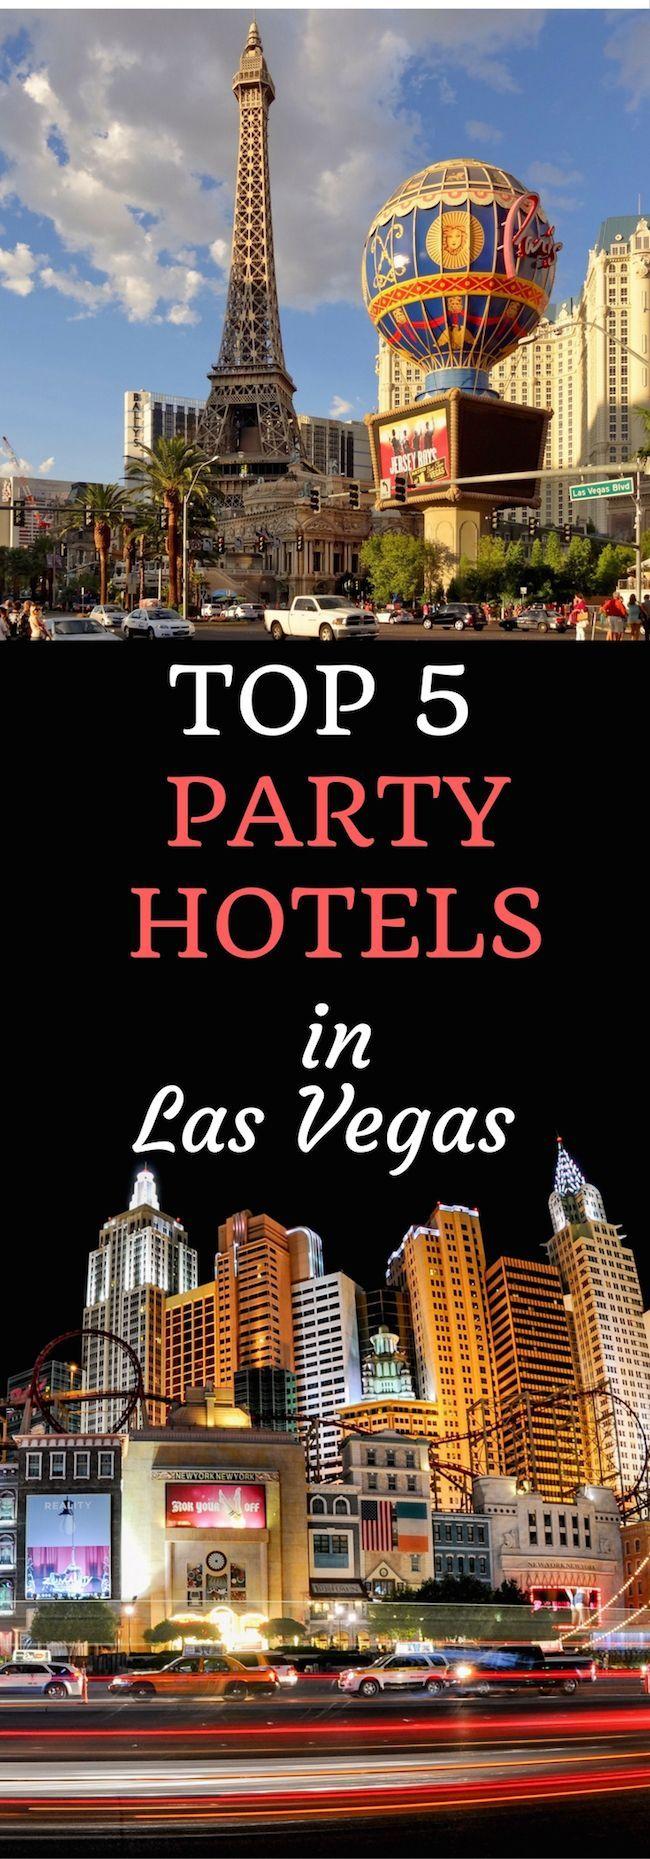 Top 5 Party Hotels In Las Vegas Best Hotels In Vegas Las Vegas Trip Las Vegas Hotels